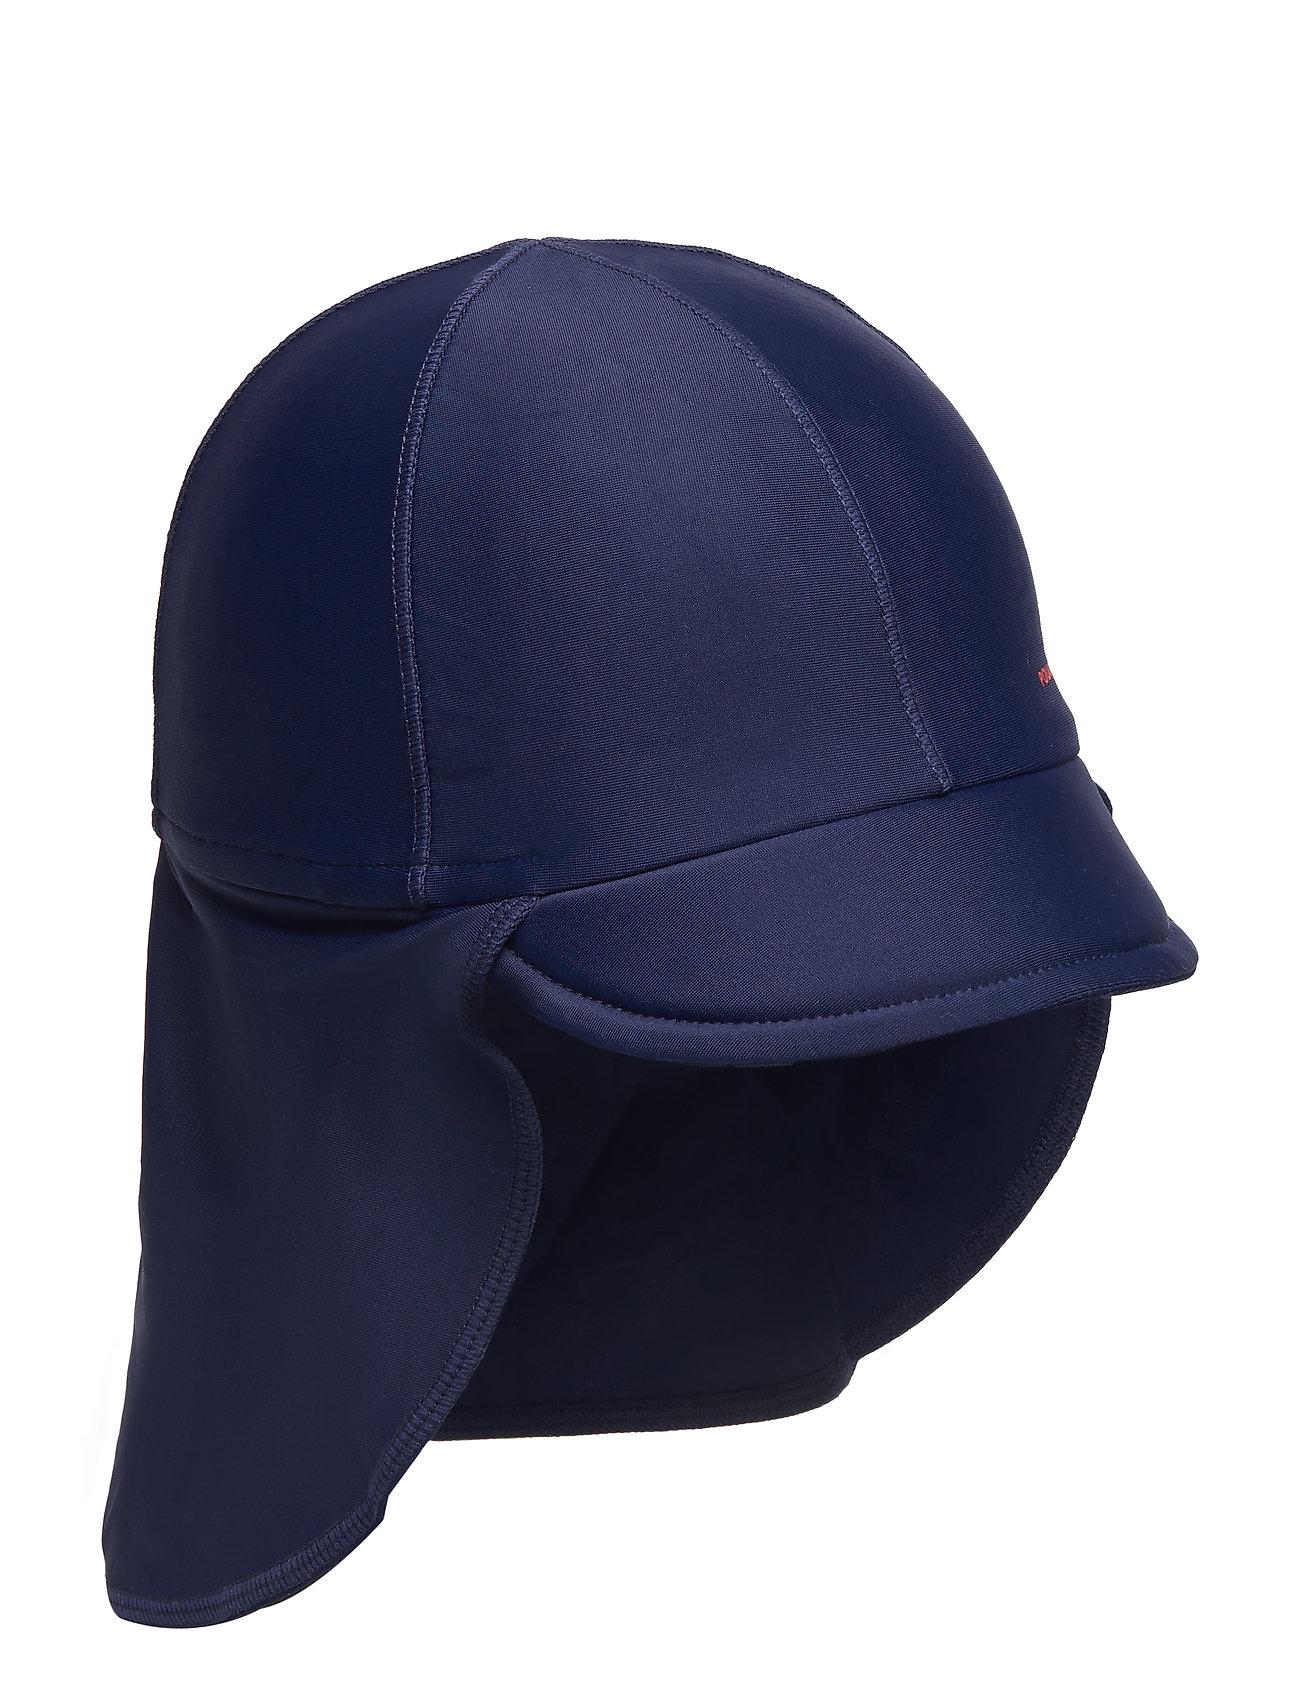 Polarn O. Pyret UPF 50 CAP Solid - DARK SAPPHIRE